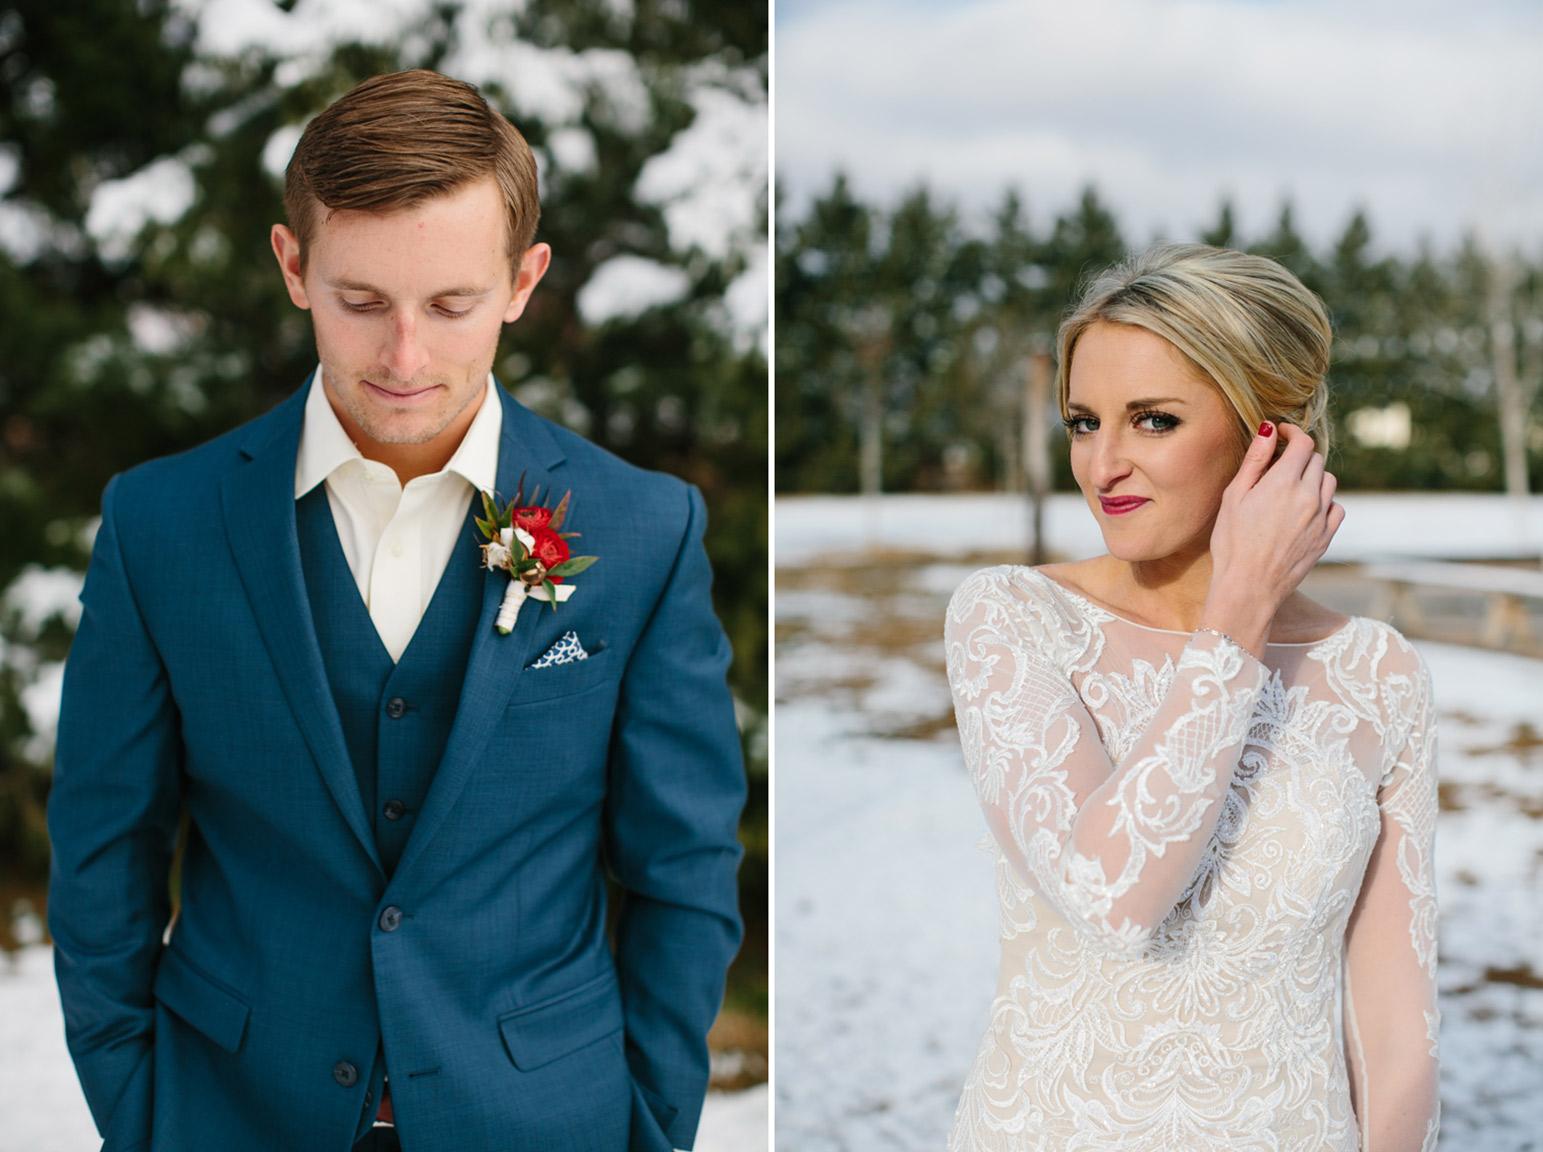 Cotton_Creek_Barn_Winter_Wedding_WeddingPhotographer031.jpg